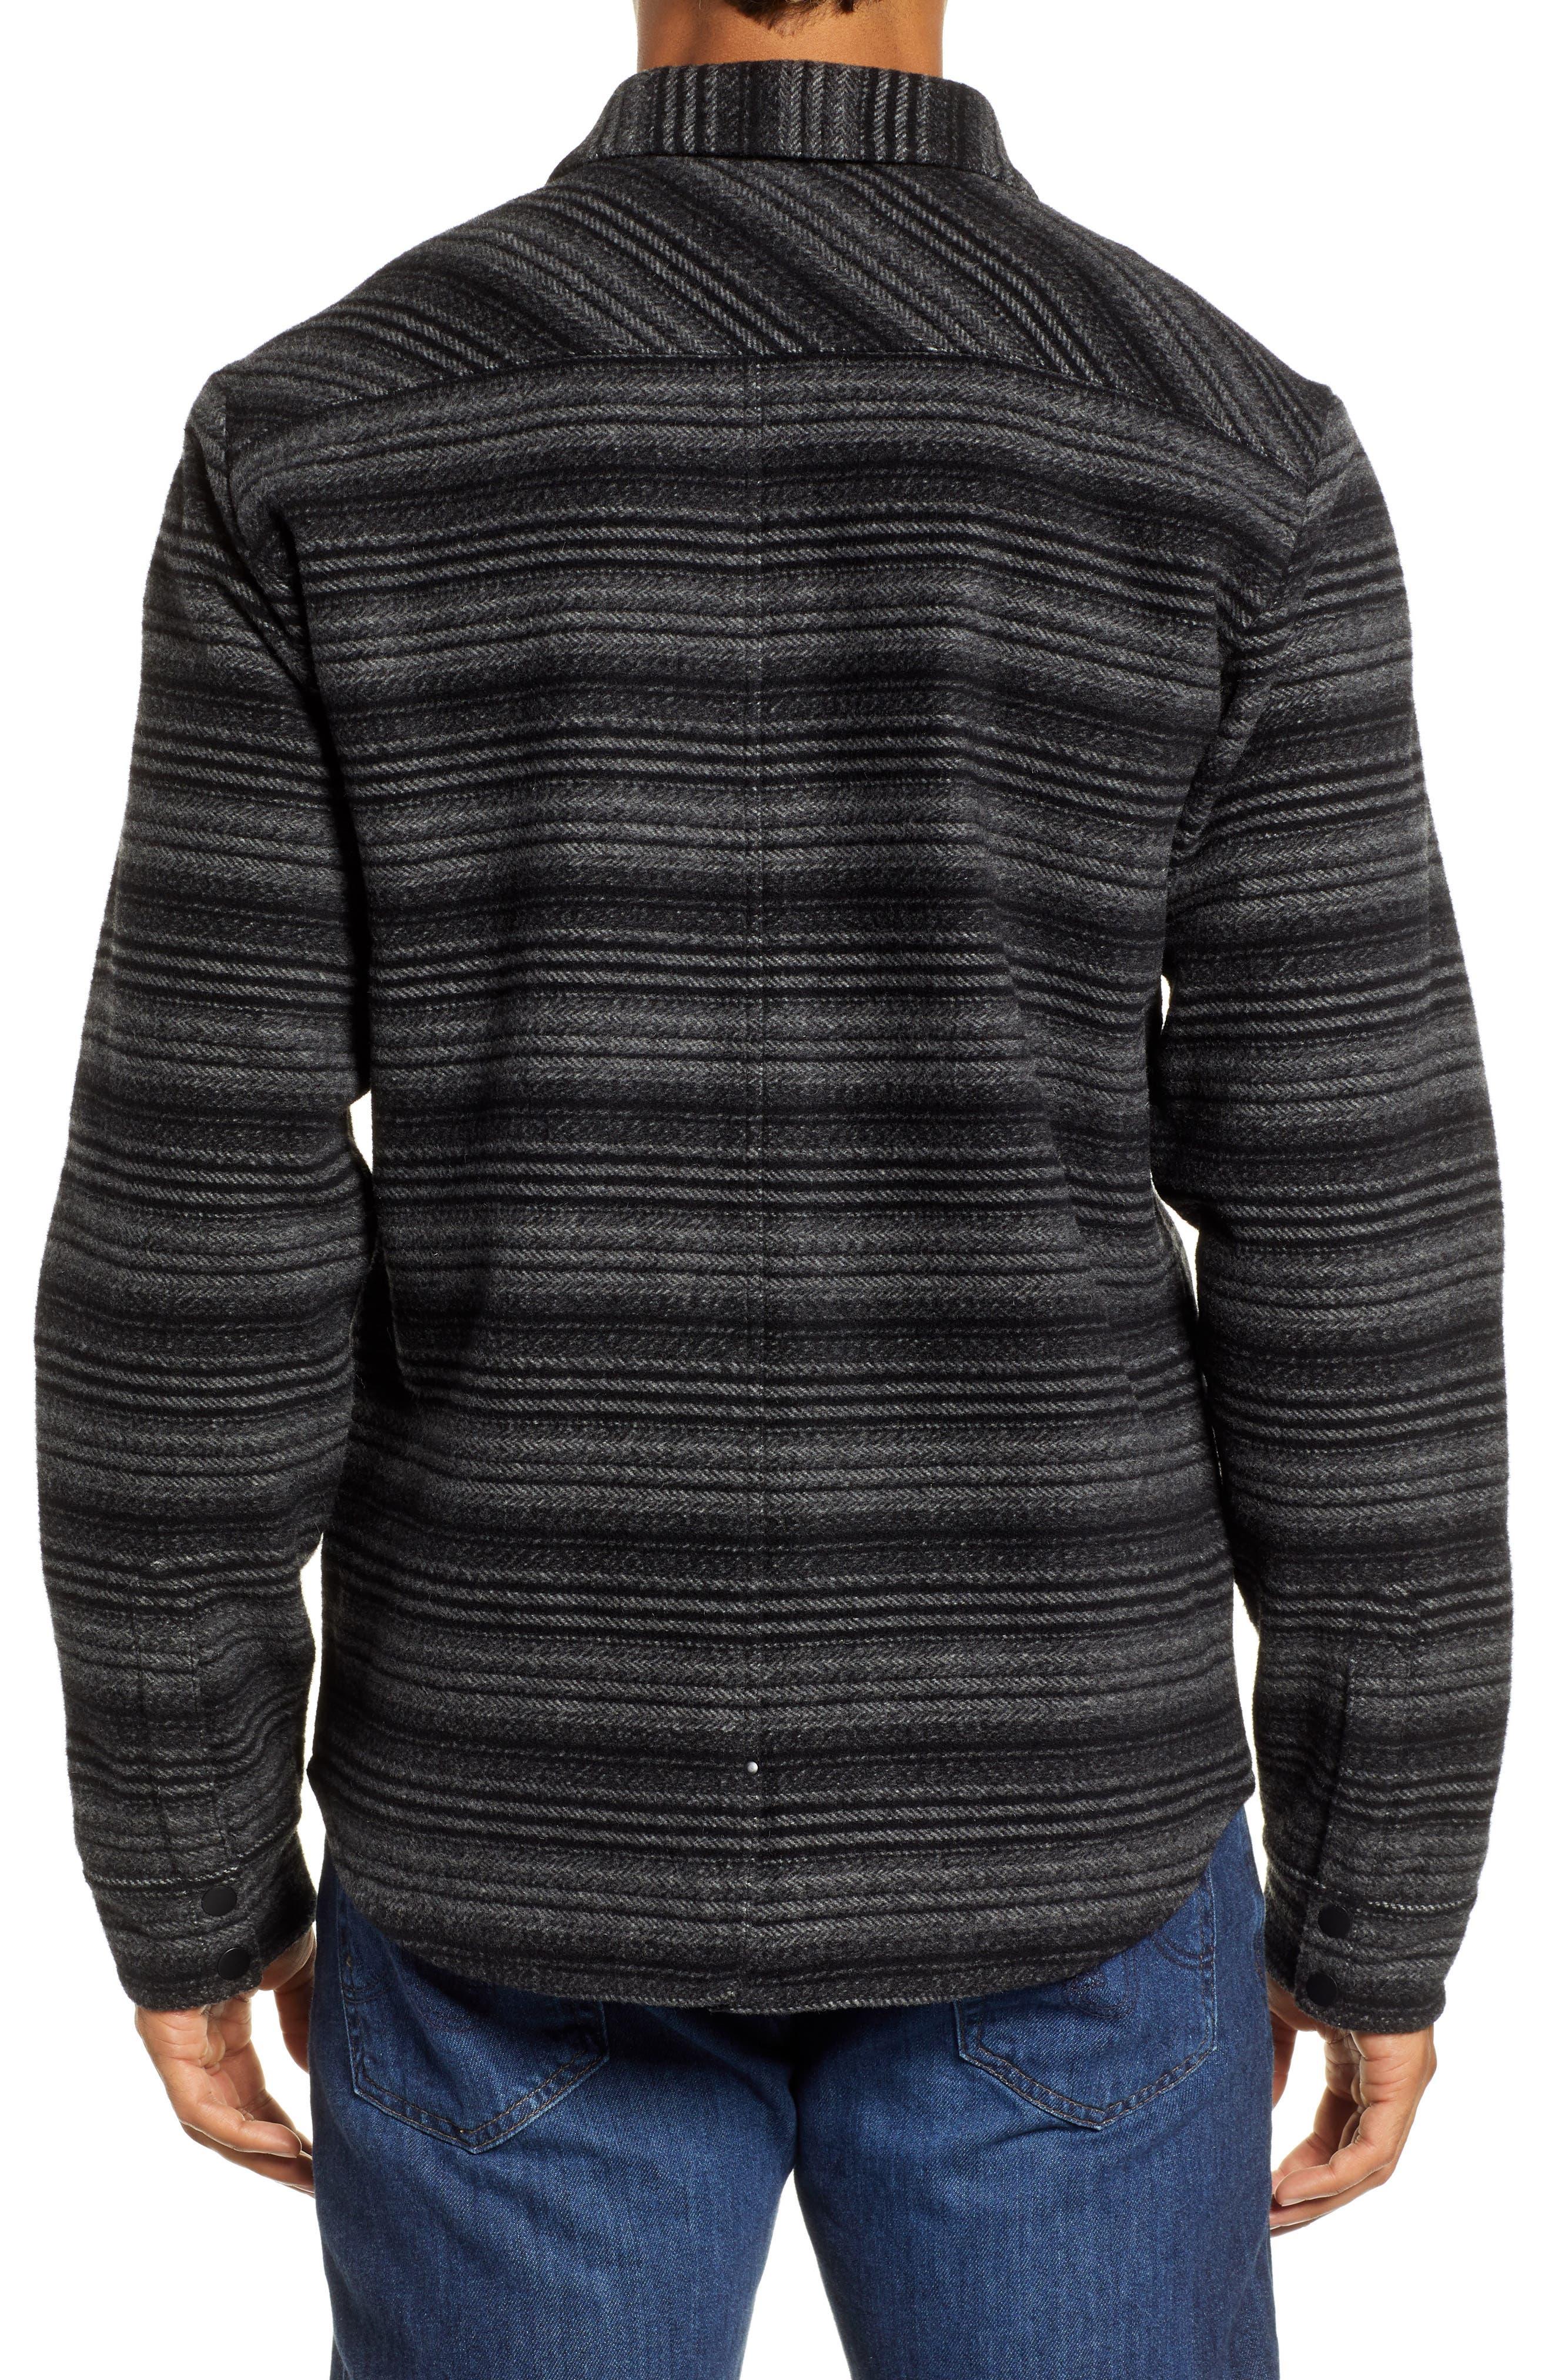 Anchor Line Flannel Shirt Jacket,                             Alternate thumbnail 3, color,                             MEDIUM GREY/ BLACK